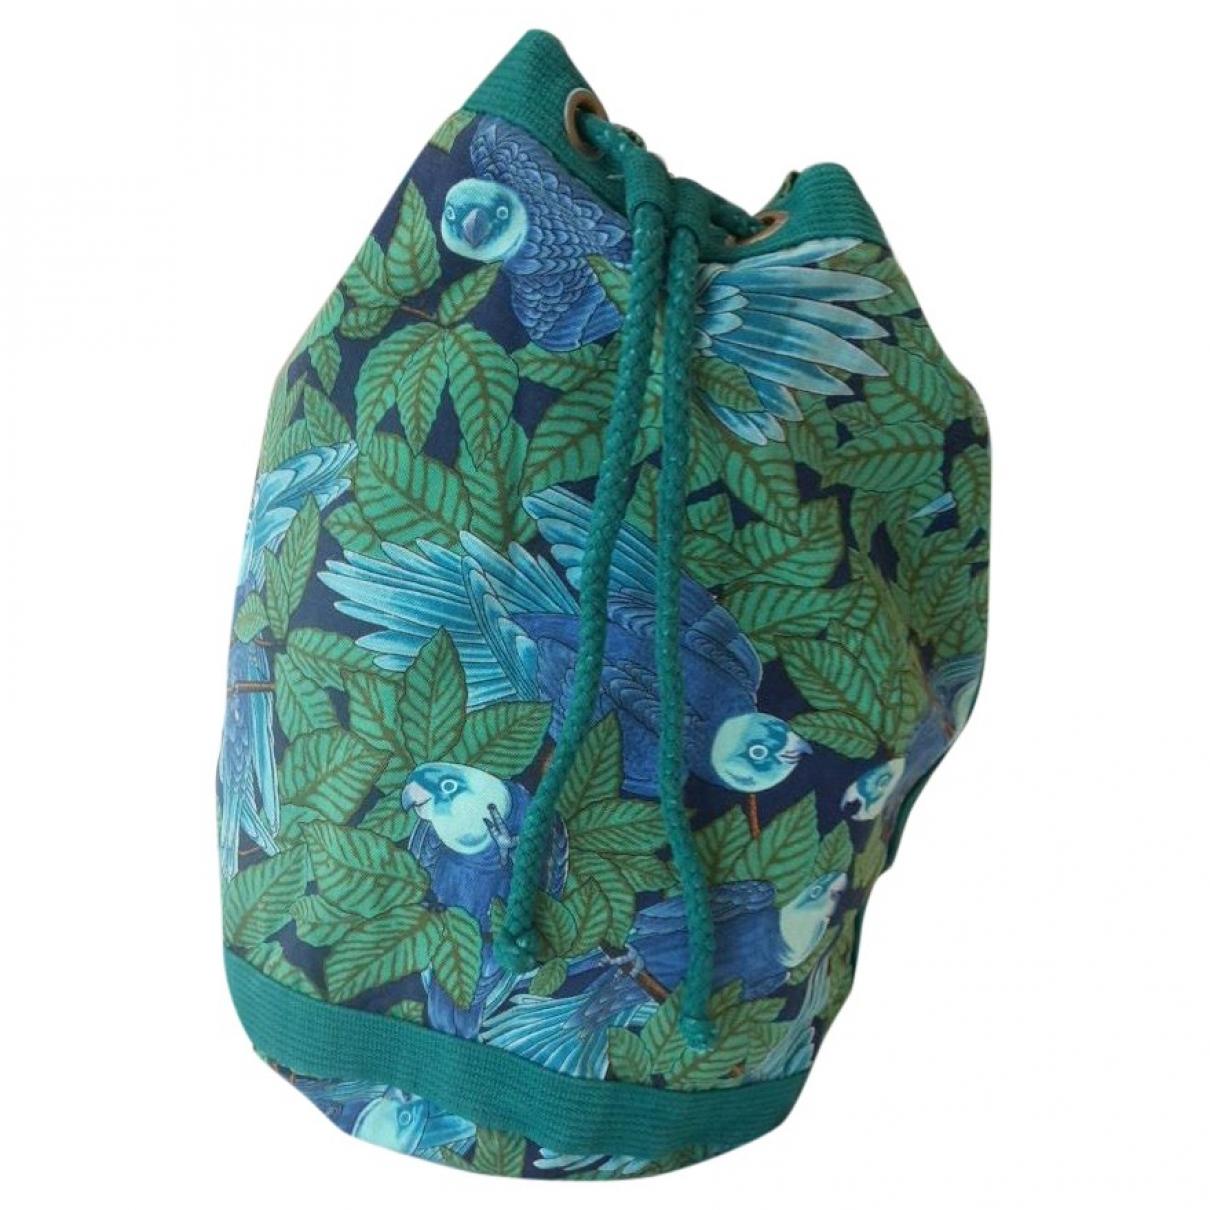 Hermes \N Handtasche in  Gruen Baumwolle